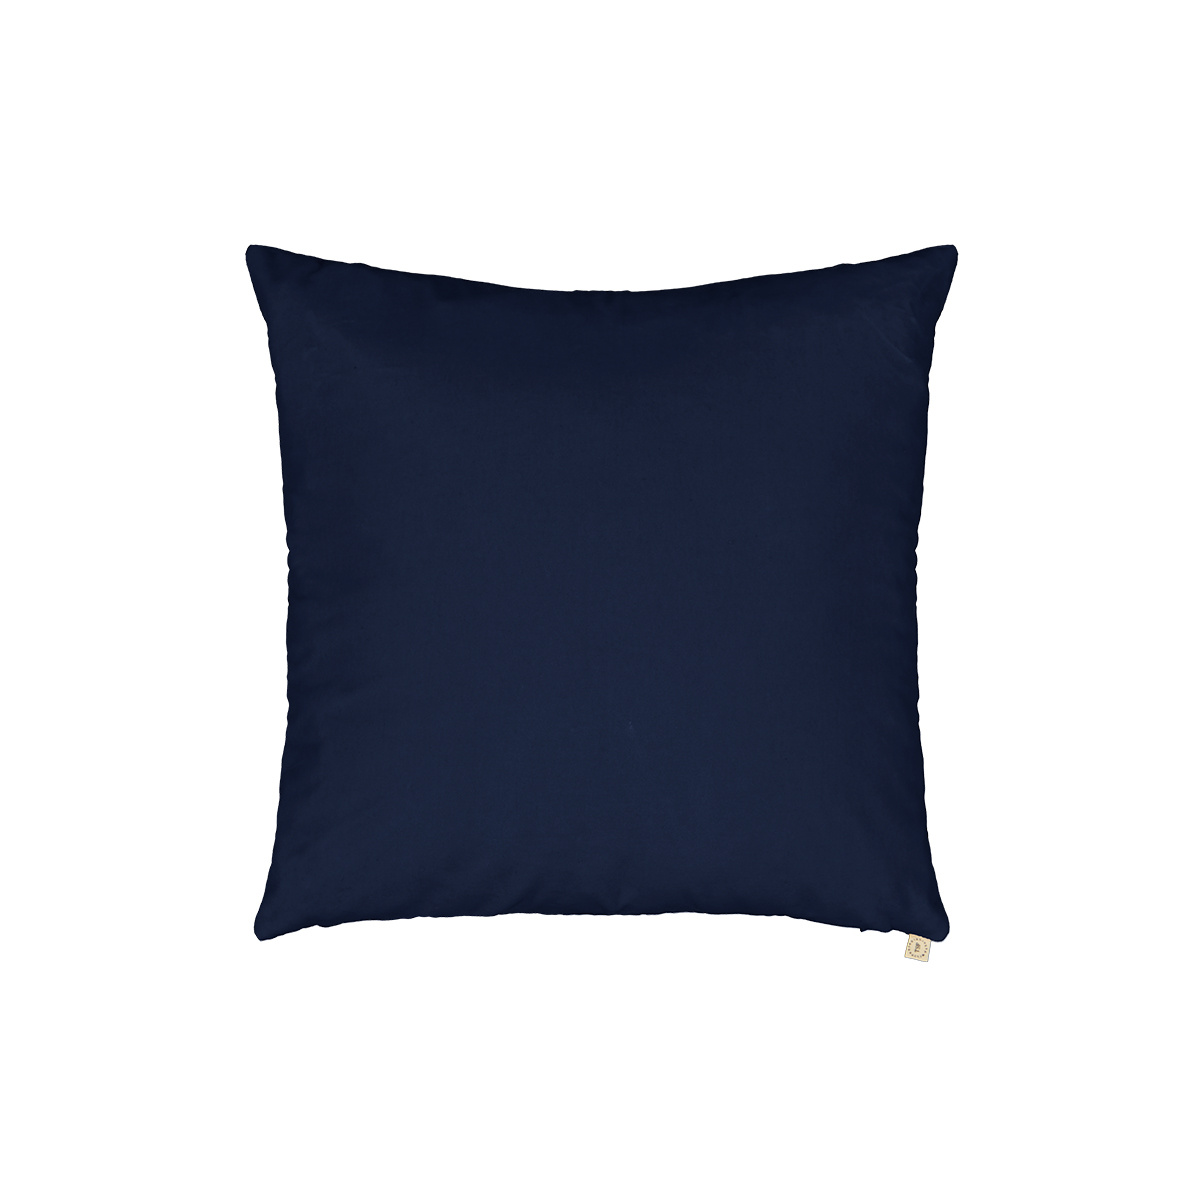 Carino Cushion Blue Navy Velvet